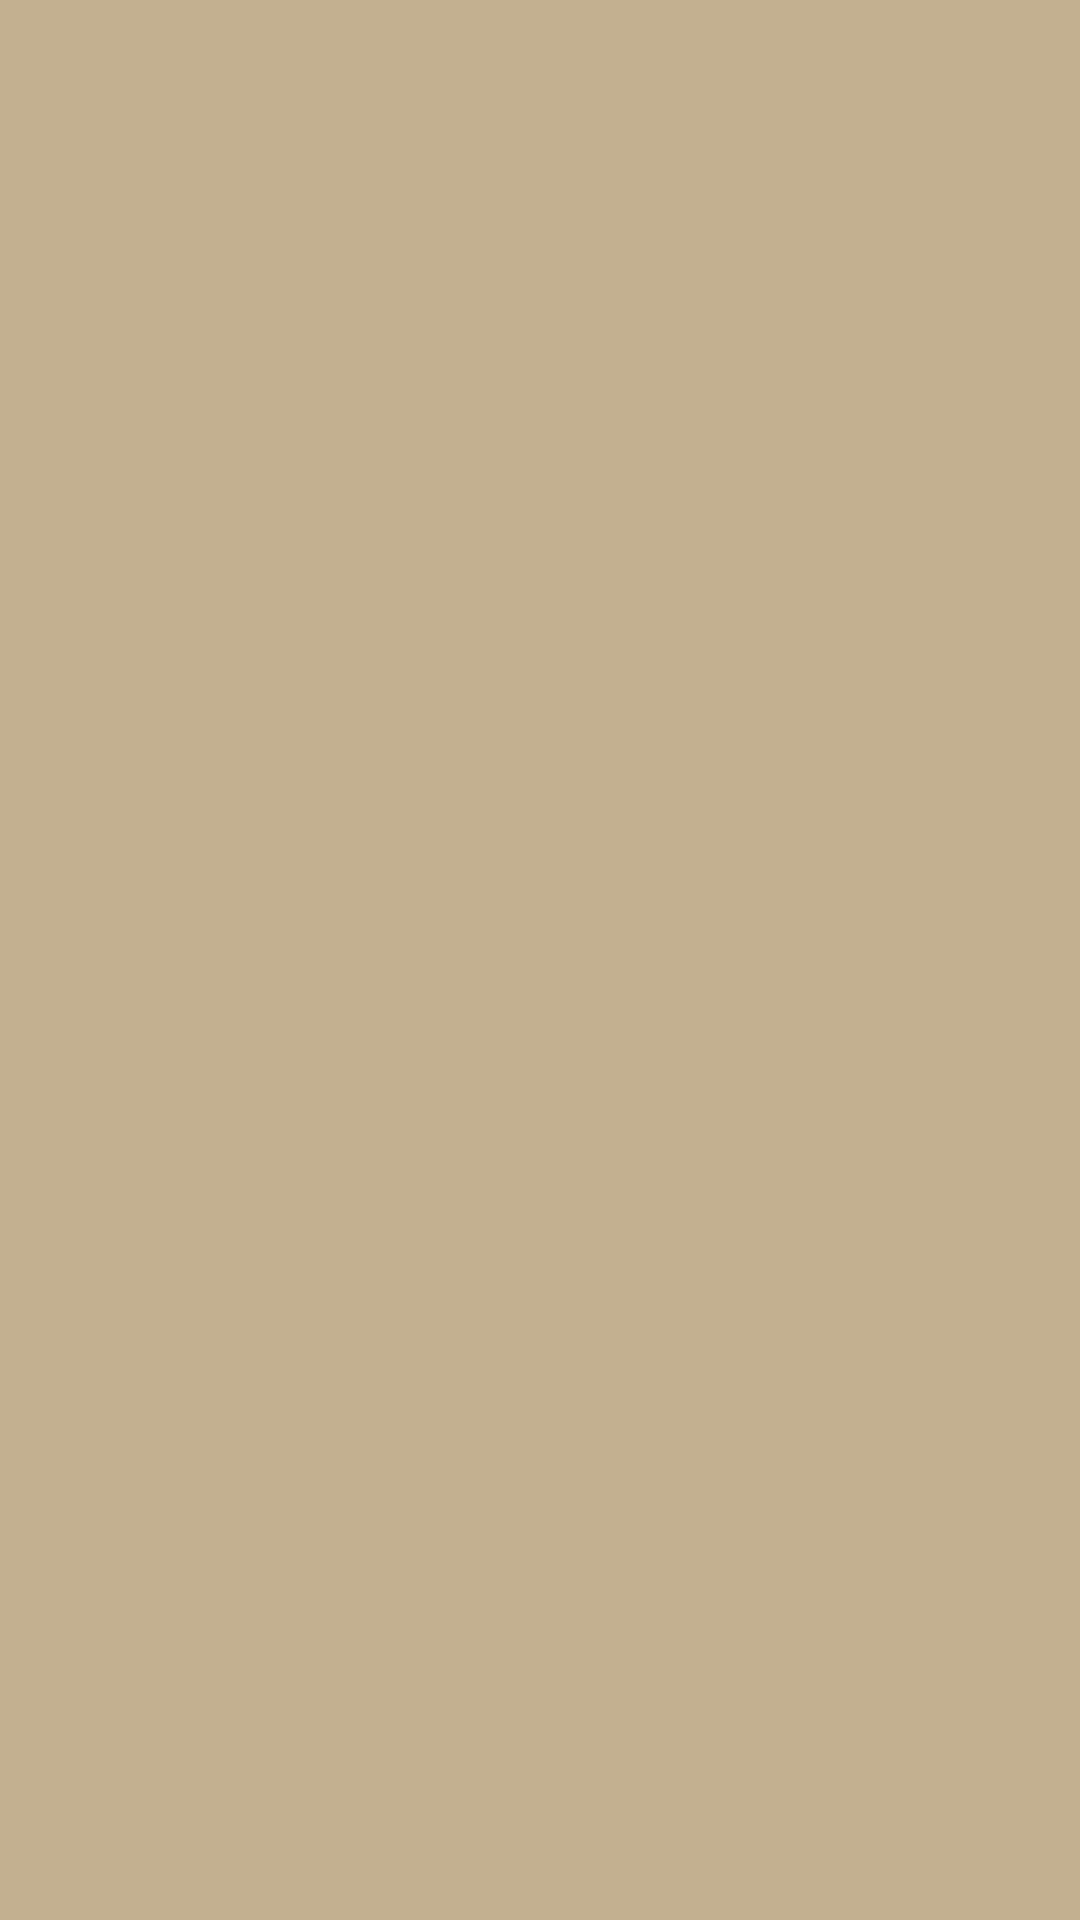 1080x1920 Khaki Web Solid Color Background